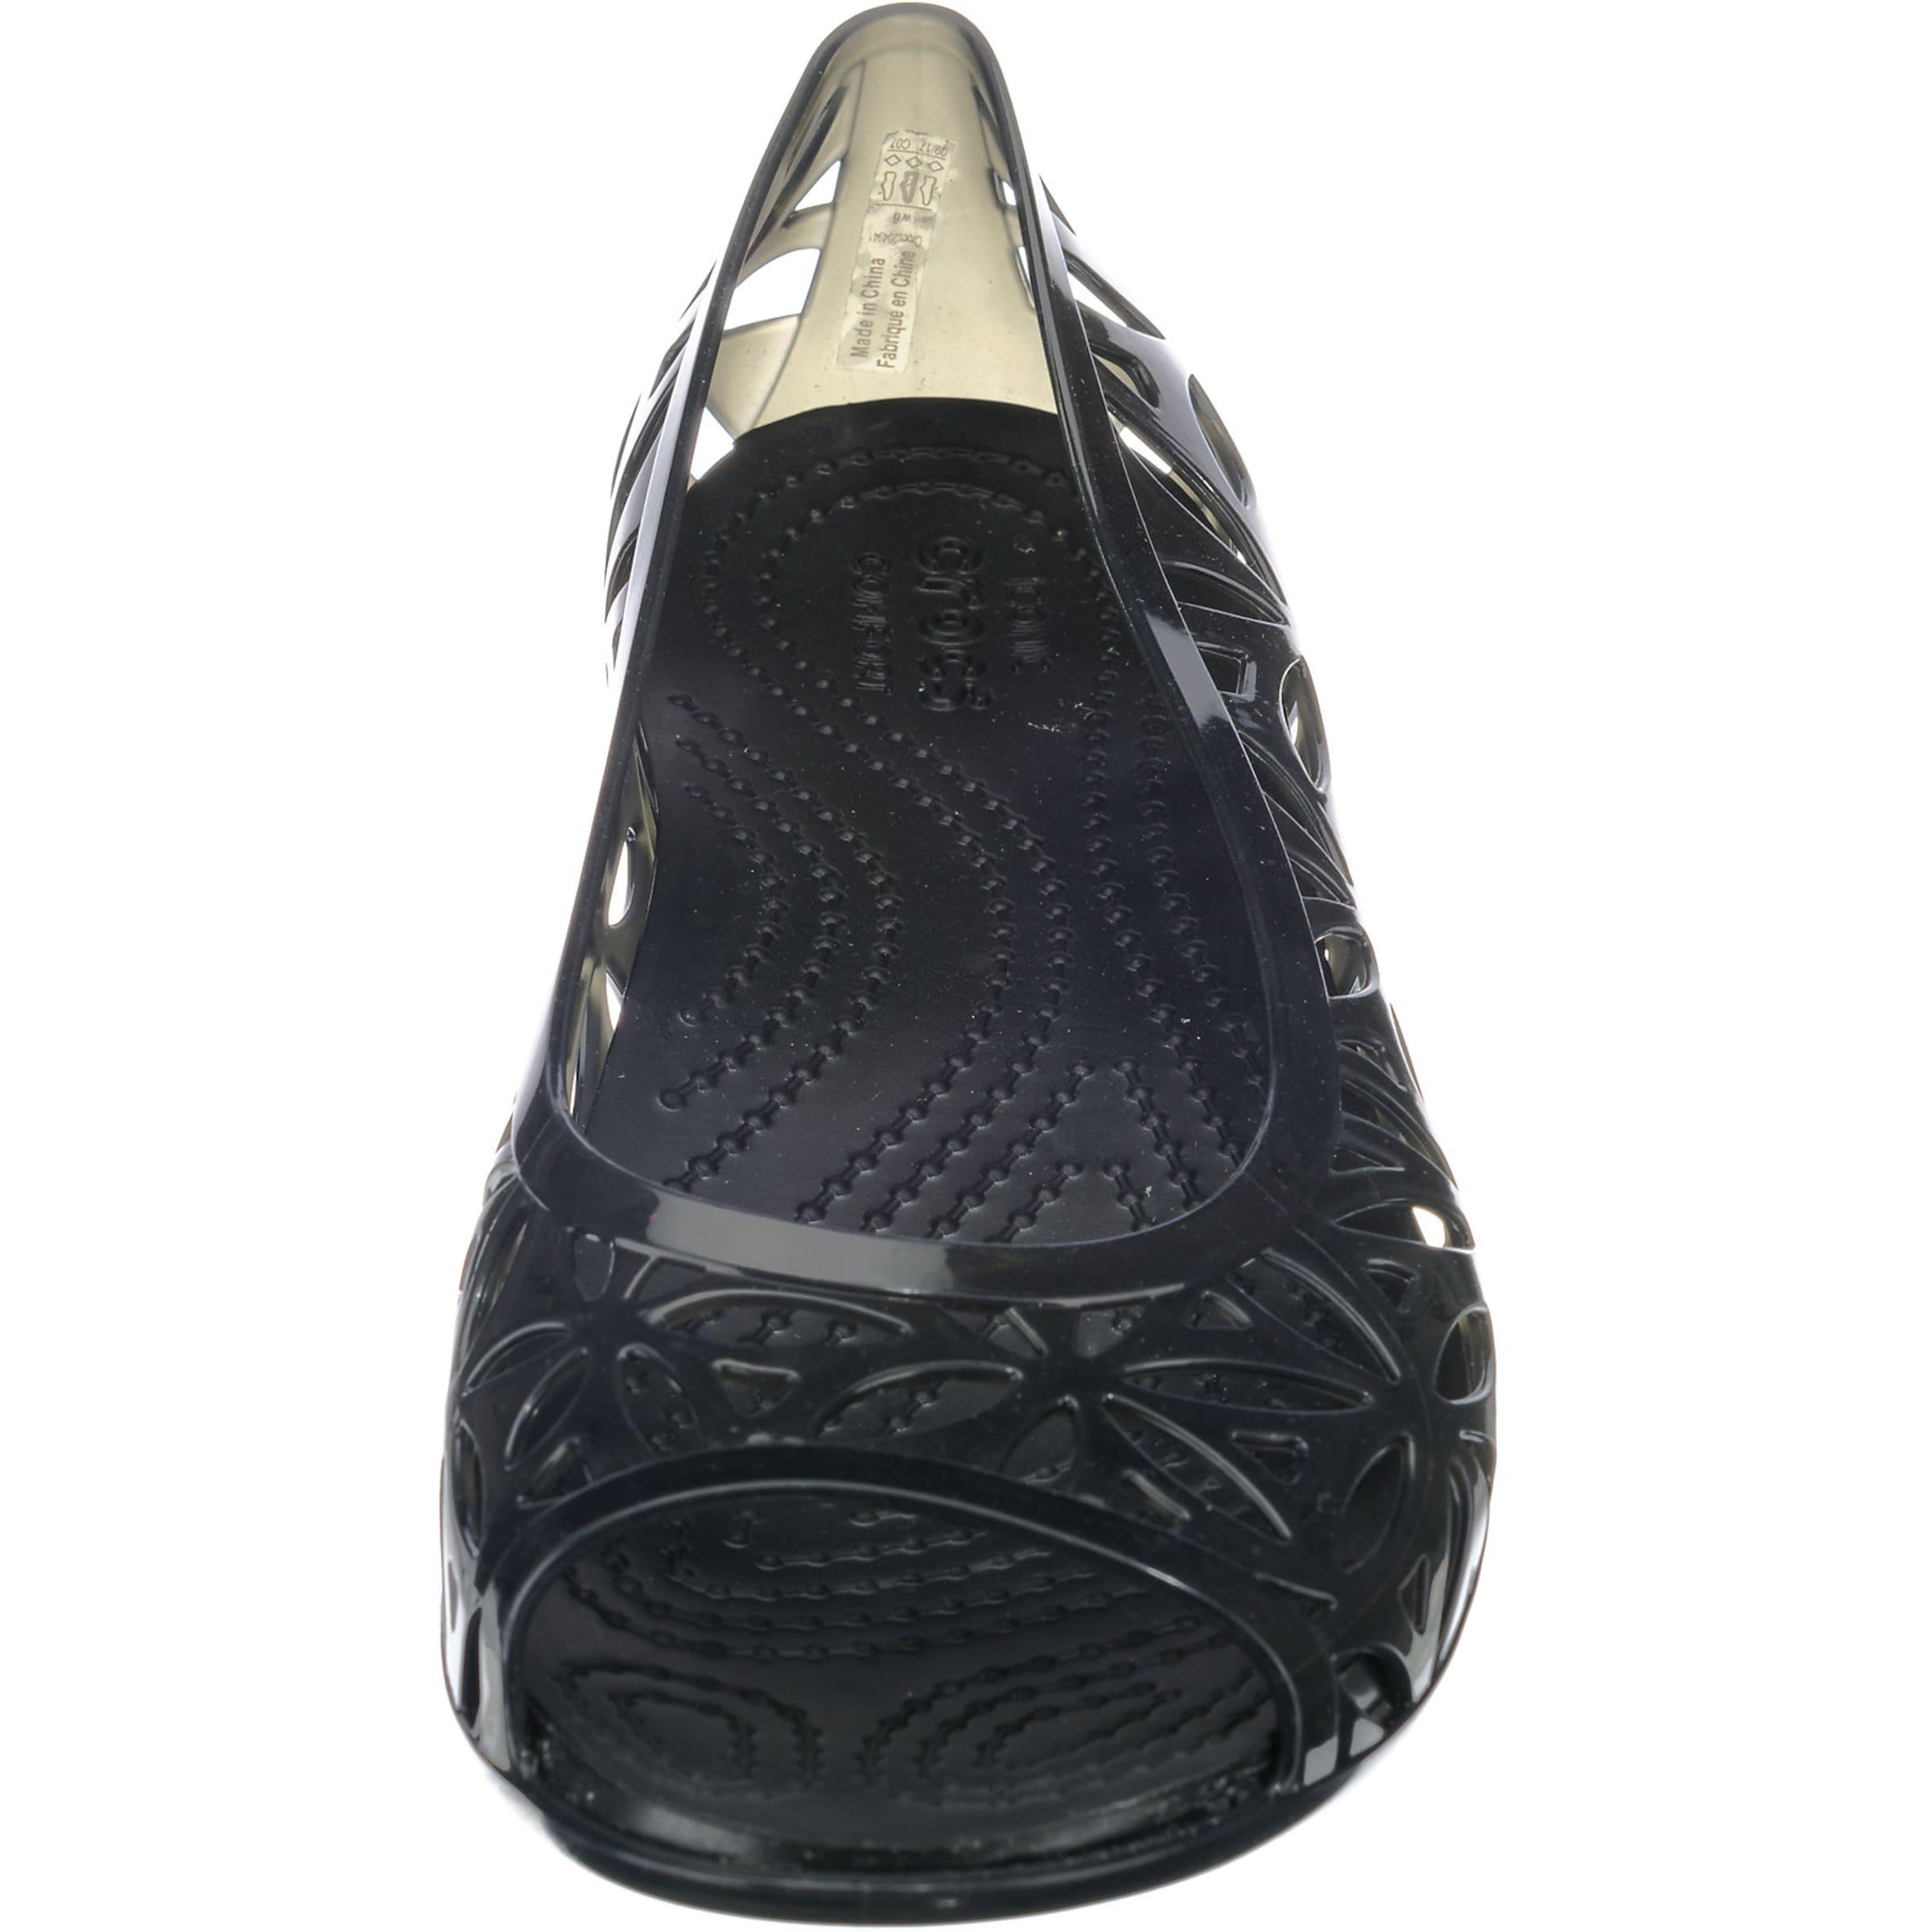 Crocs Isabella Jelly II Flat W Komfort-Ballerinas Begrenzt GXMaZ8Q